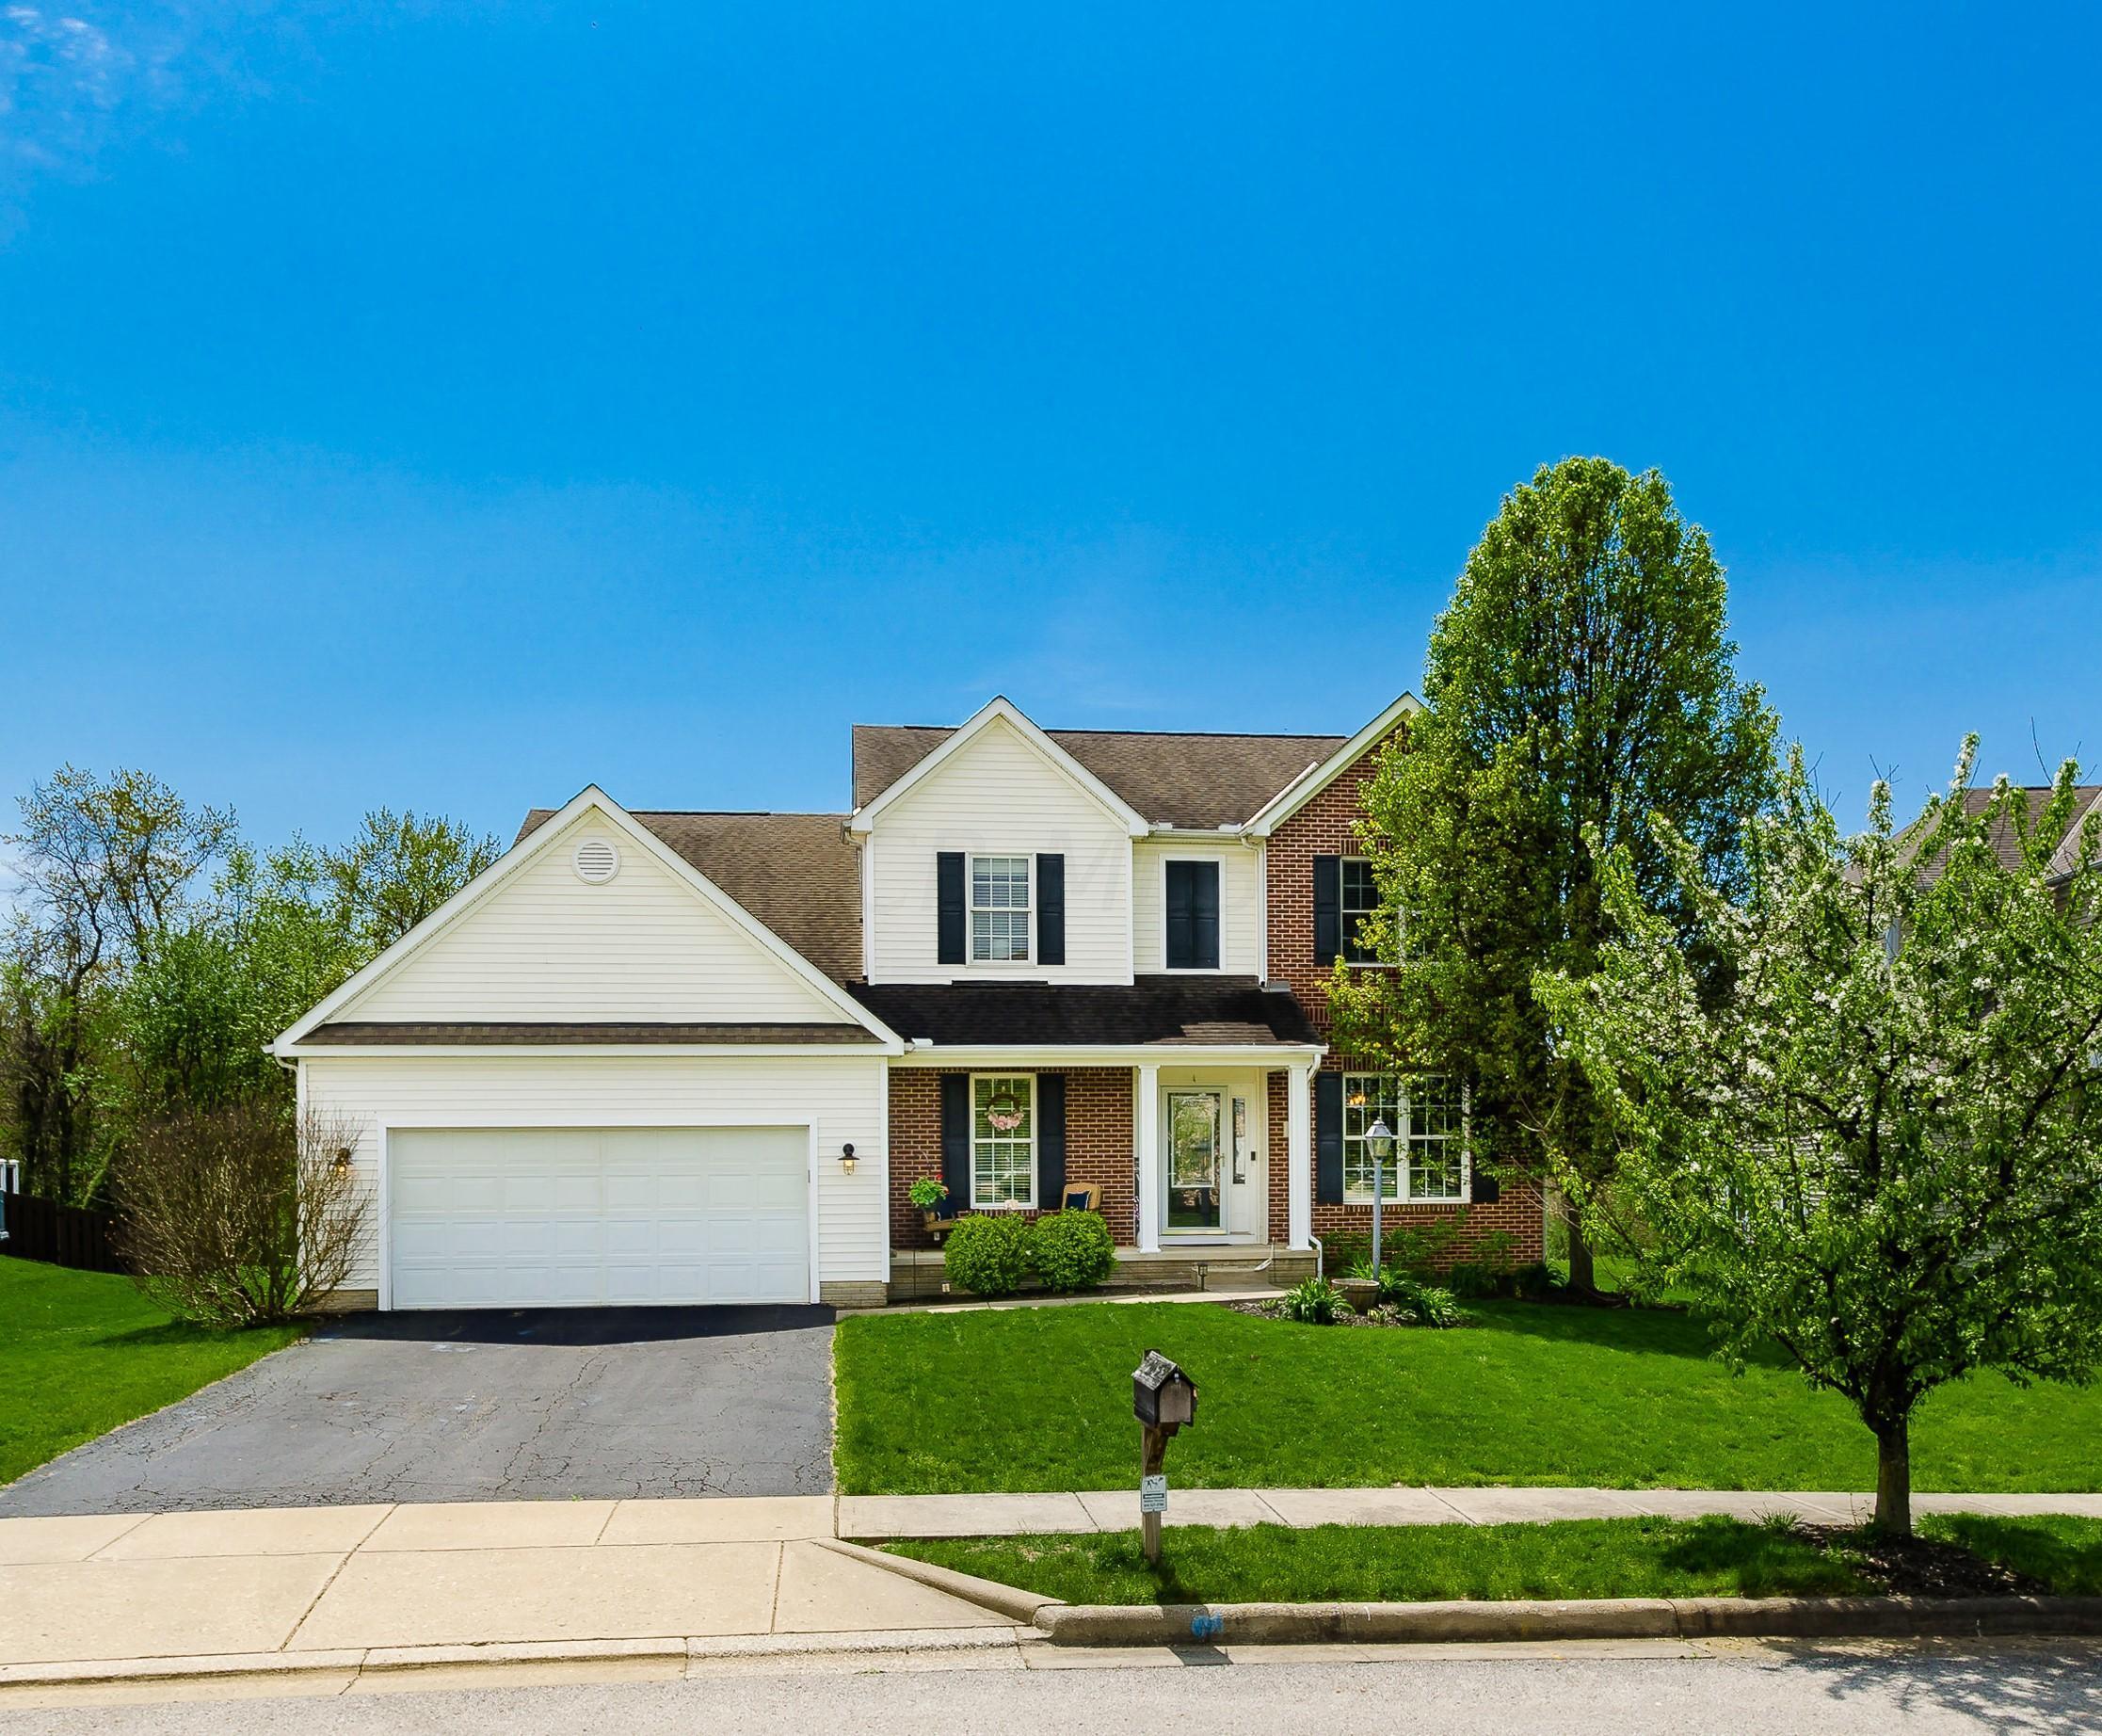 Photo of 217 Fox Glen Drive E, Pickerington, OH 43147